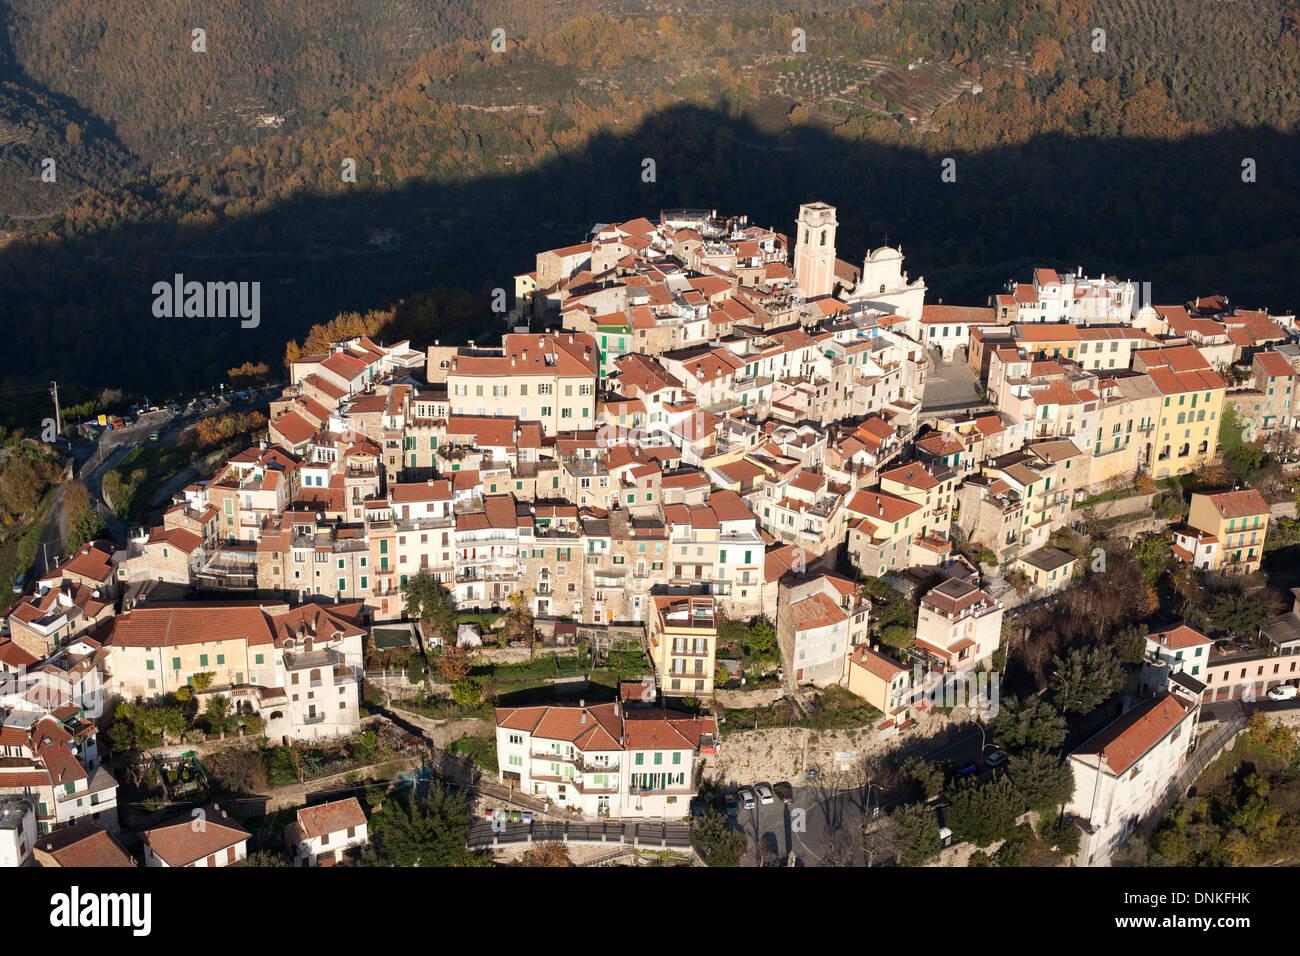 PERCHED MEDIEVAL VILLAGE (aerial view). Perinaldo, Province of Imperia, Liguria, Italy. Stock Photo